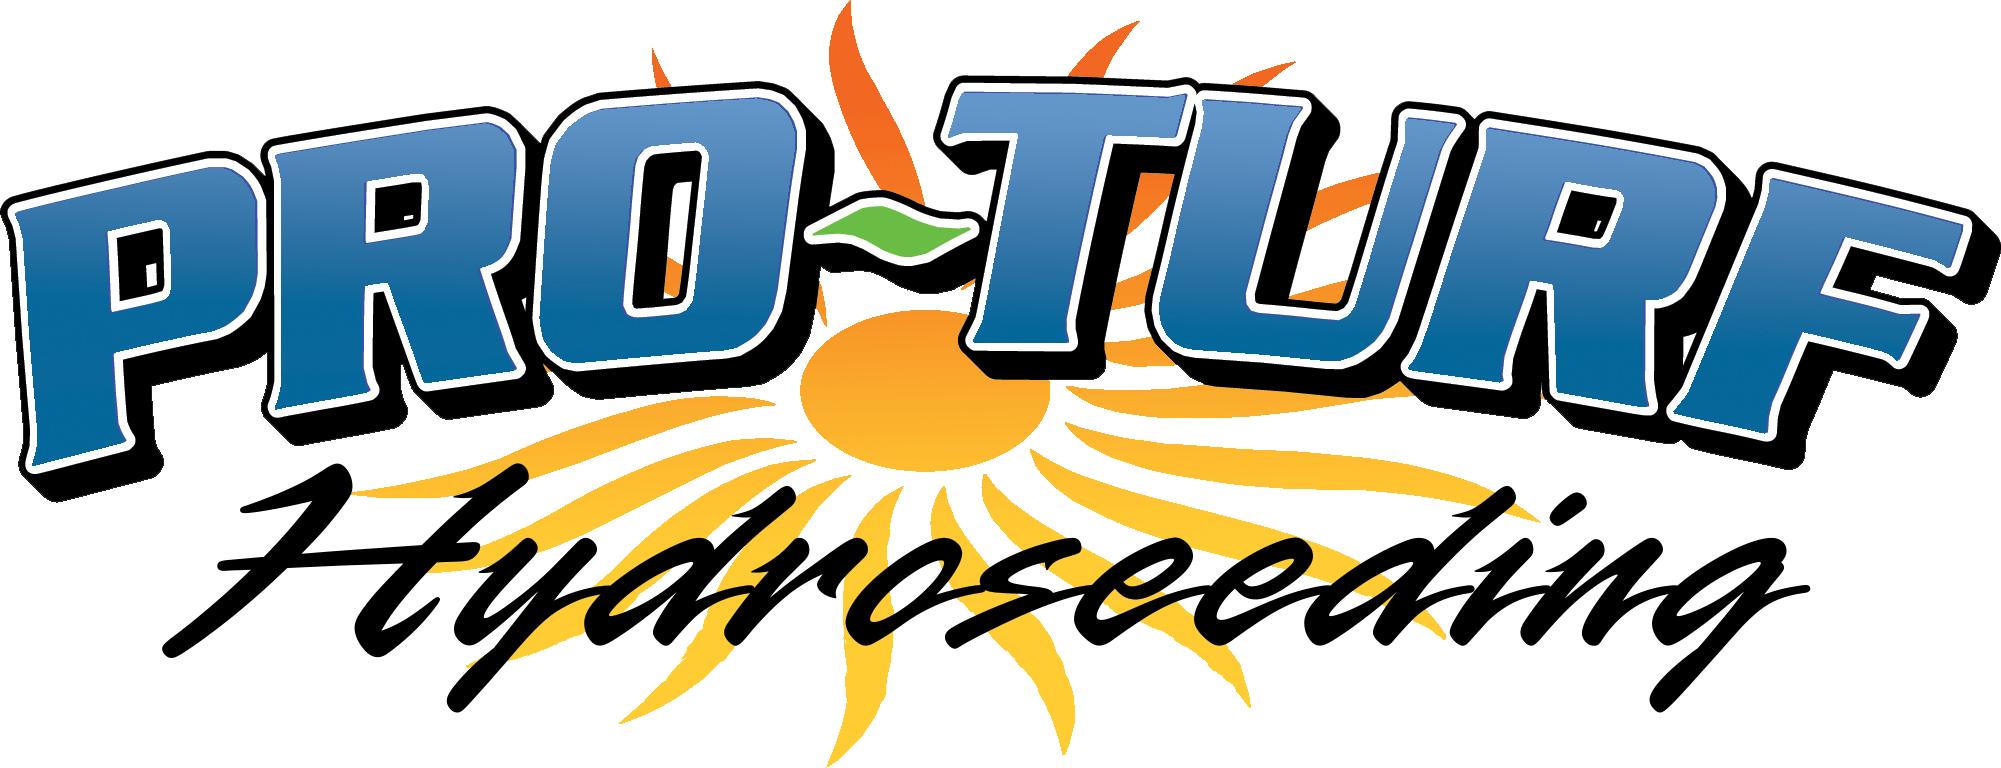 Pro-Turf Hydroseed